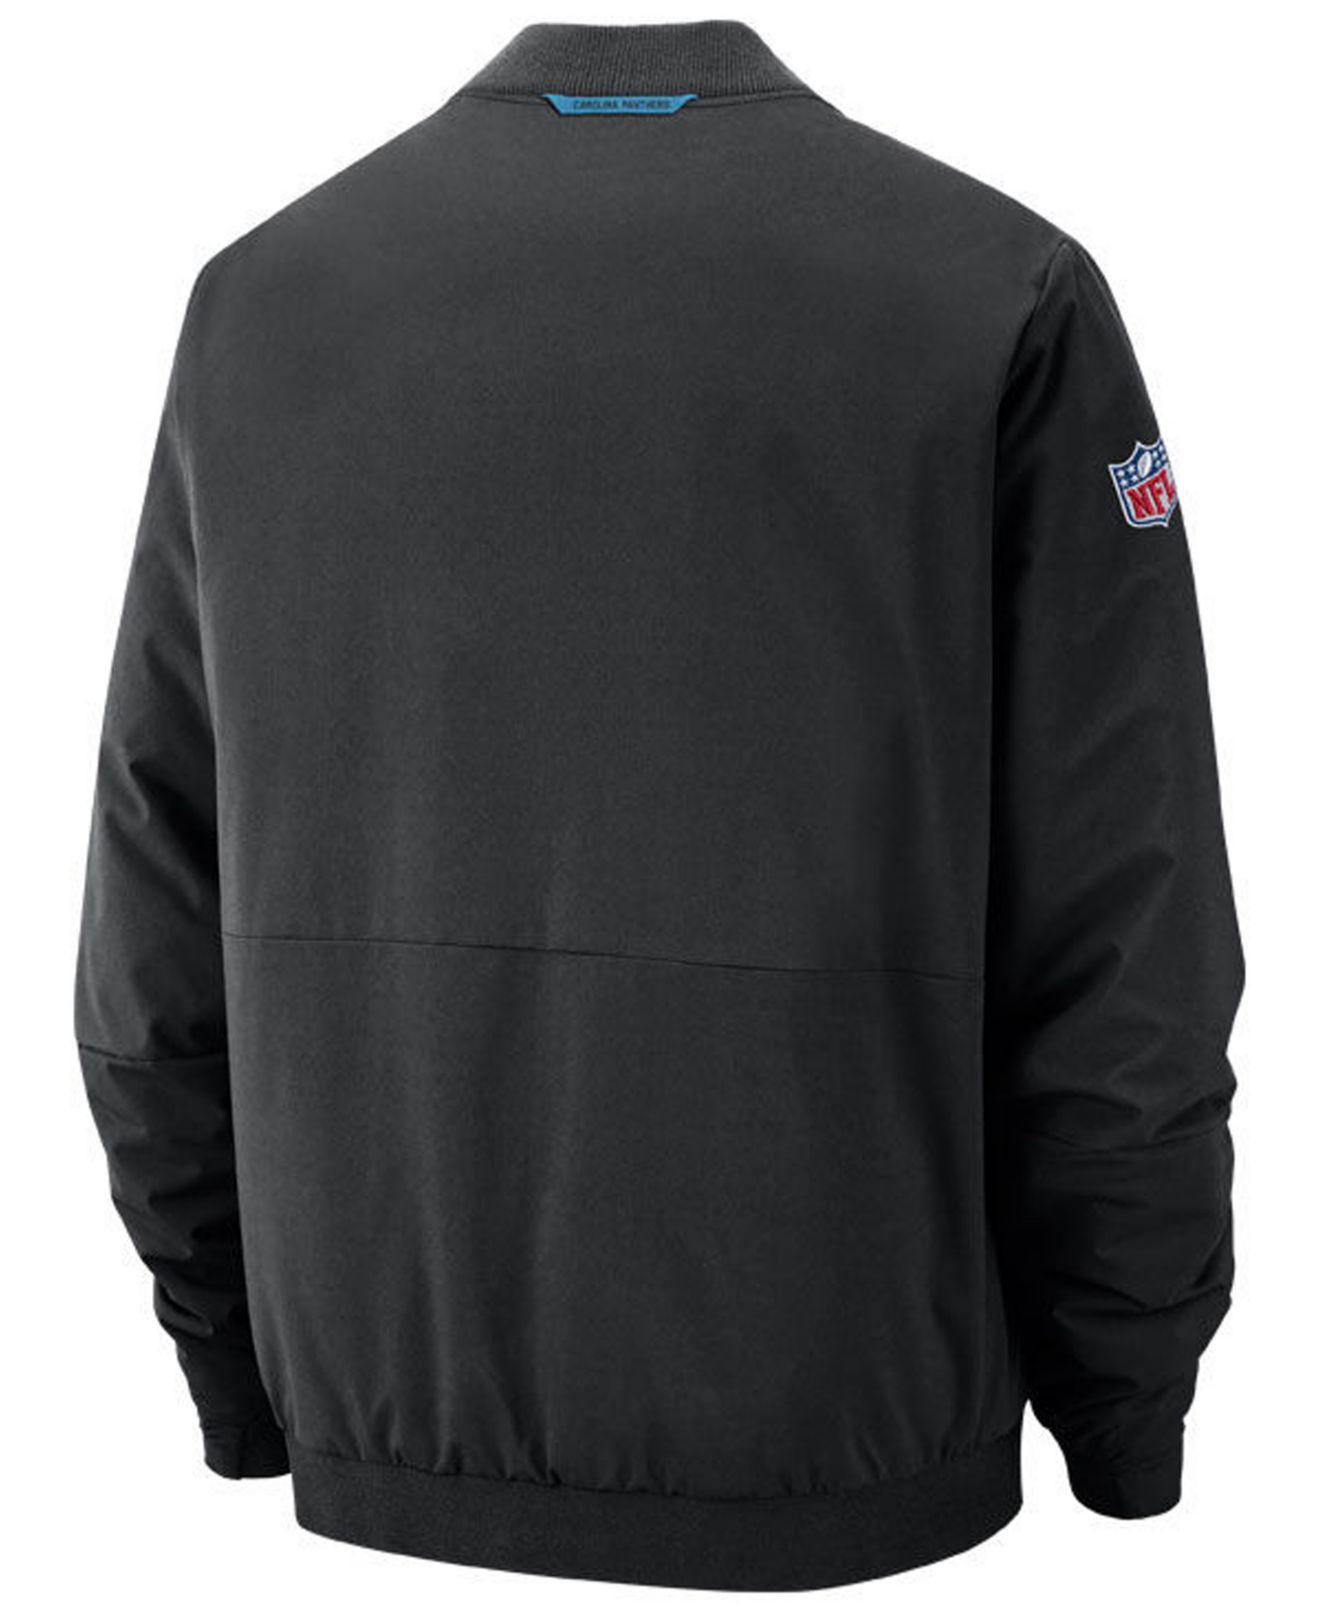 Lyst - Nike Carolina Panthers Bomber Jacket in Black for Men 4c3a2037c